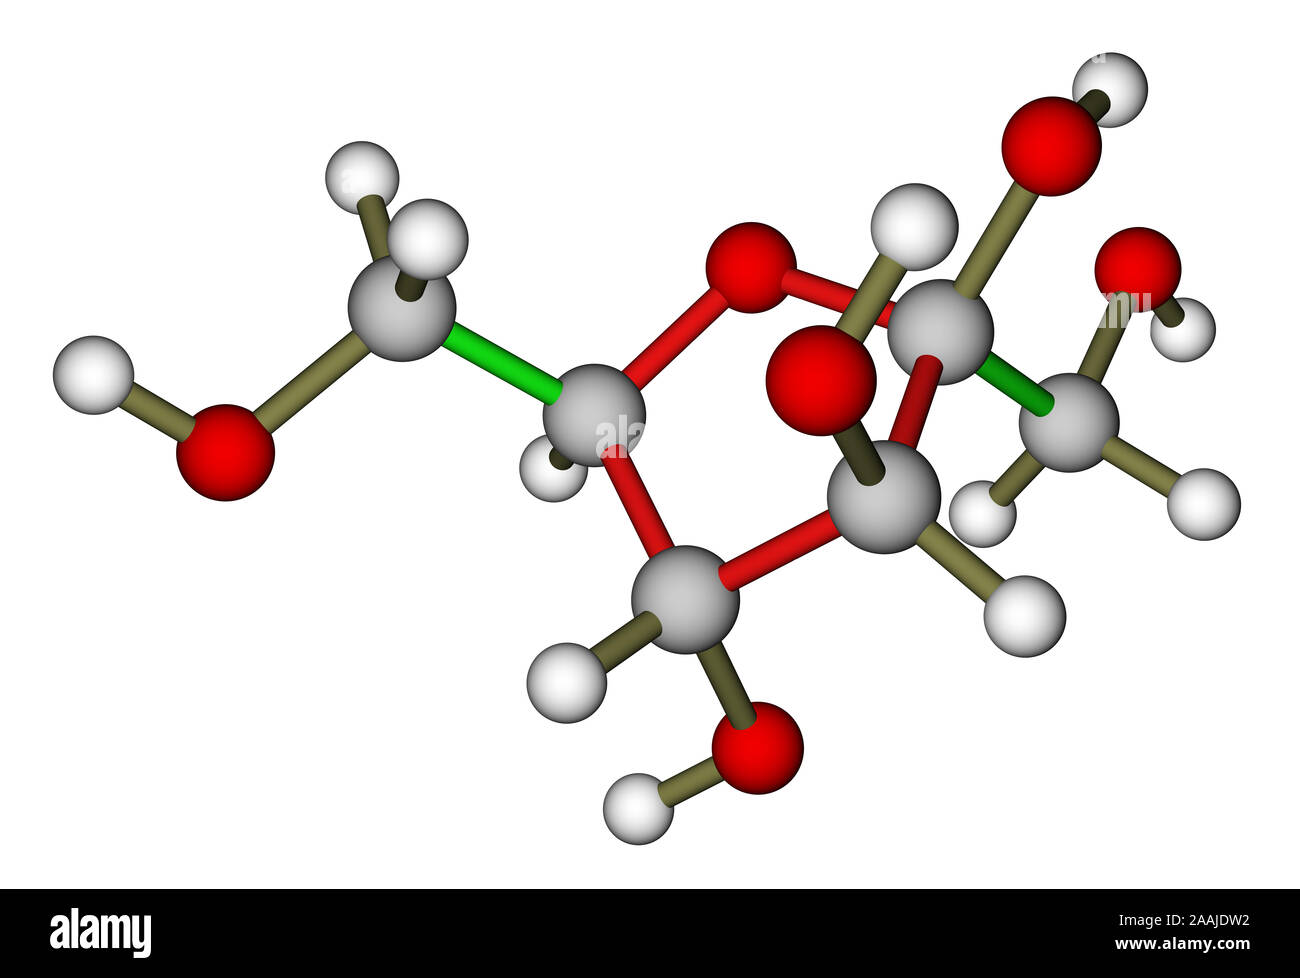 Fructosa Estructura Molecular Foto Imagen De Stock